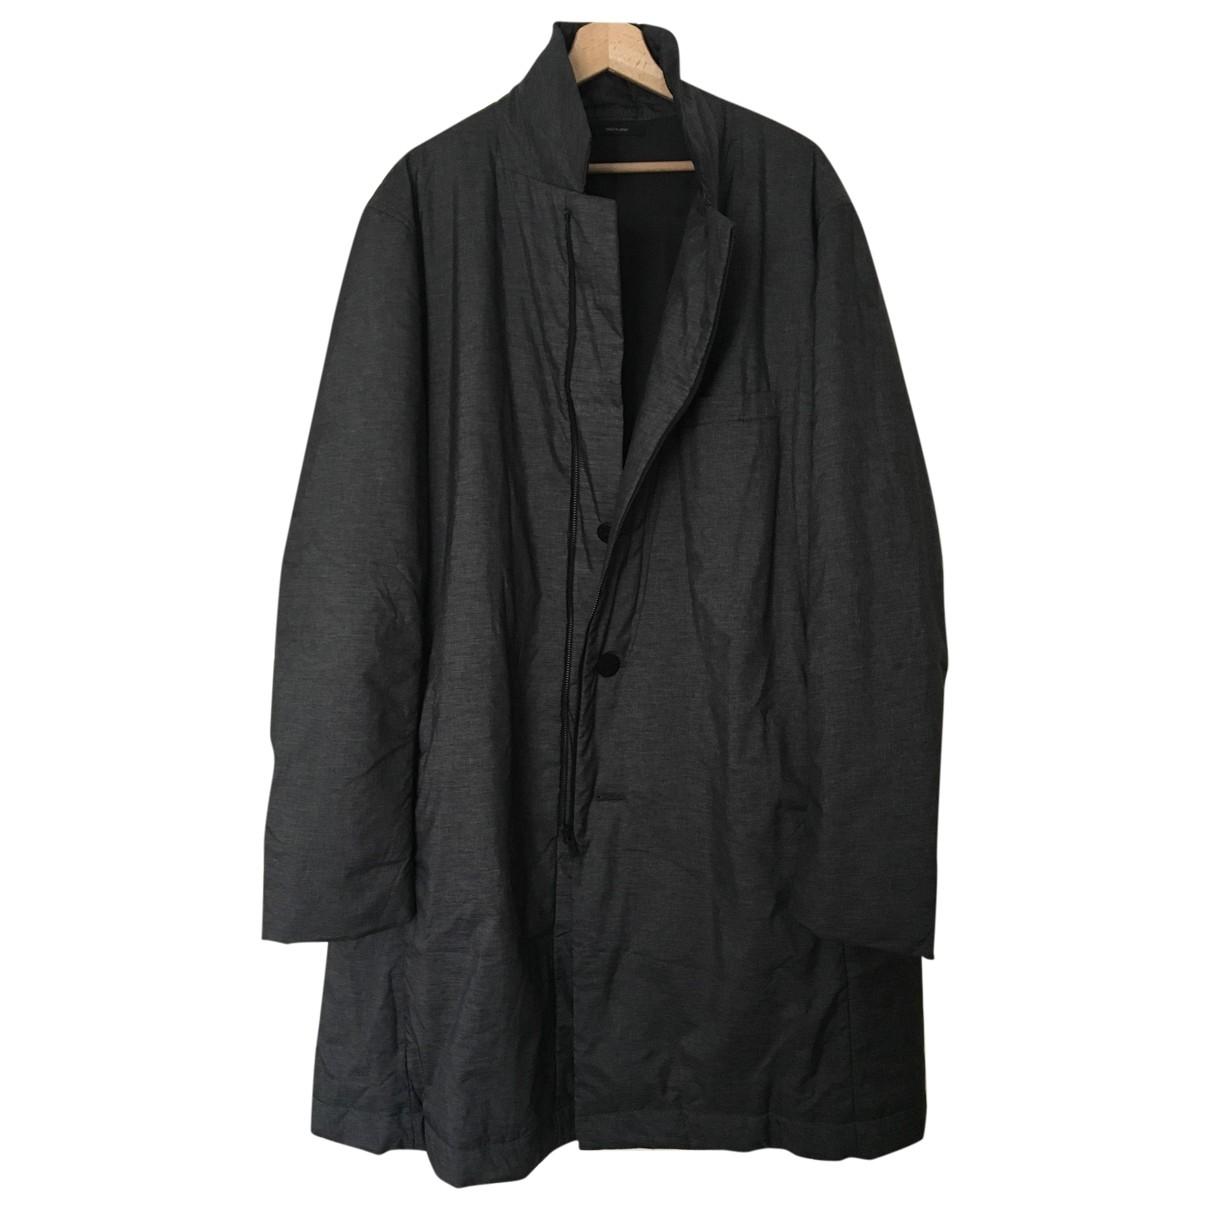 Issey Miyake \N Anthracite coat  for Men 5 0 - 6